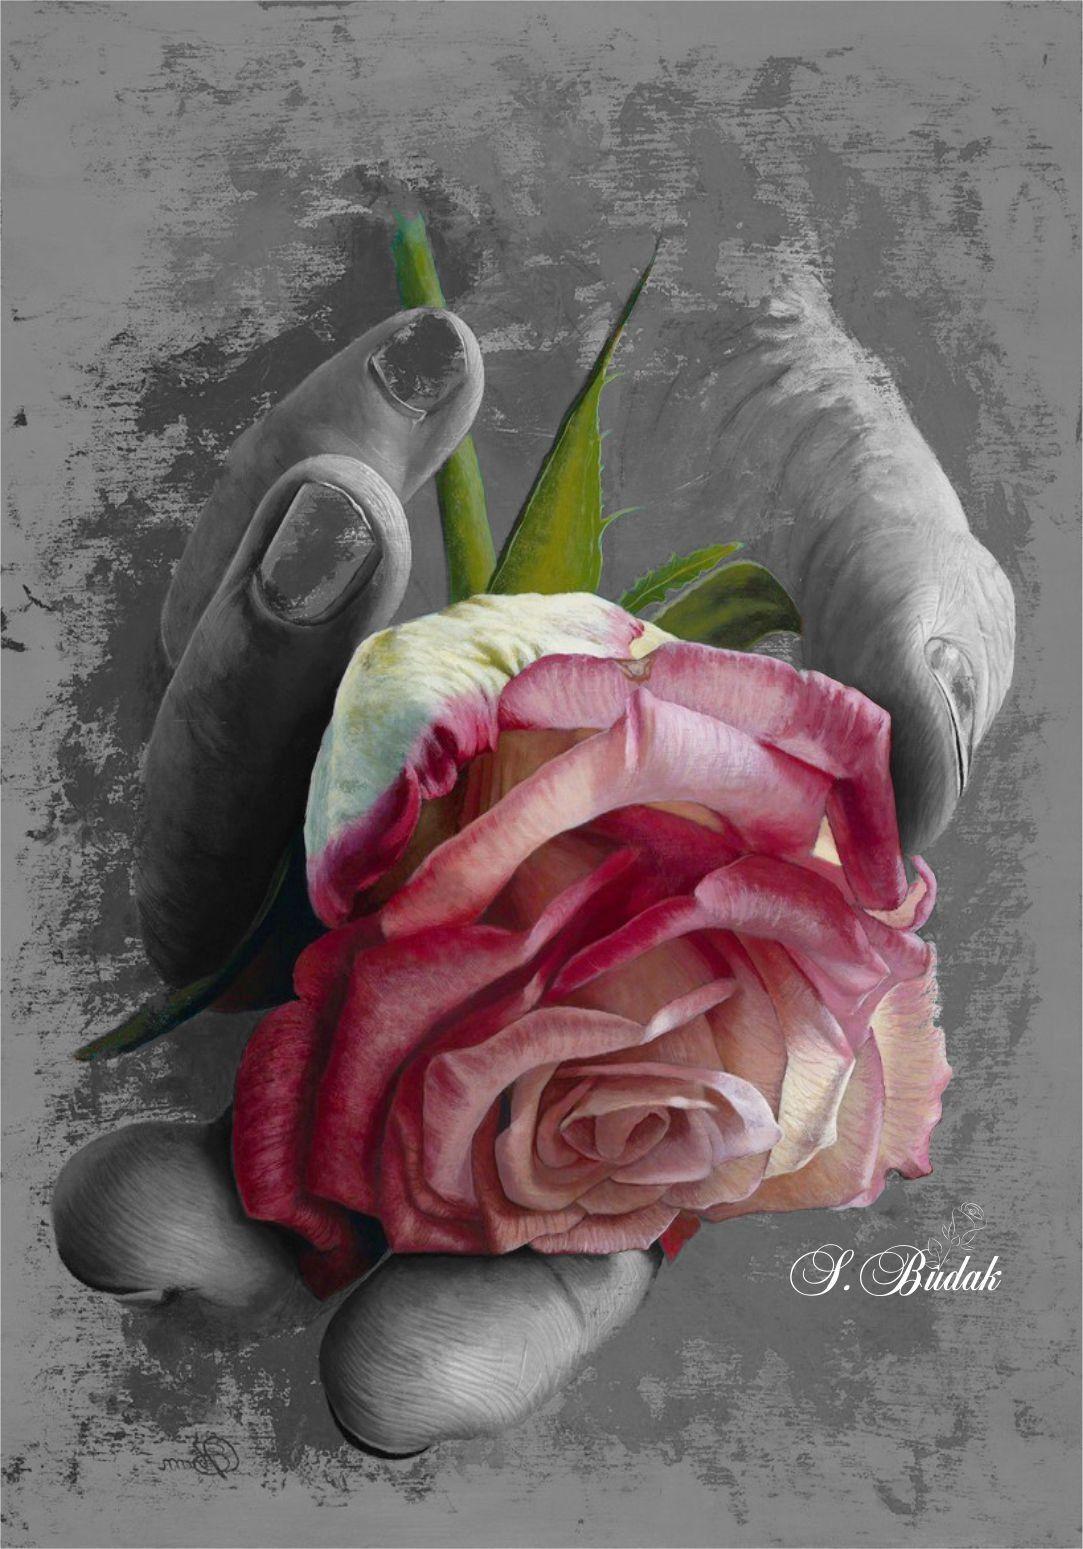 Pin by Kardelen on G.aydın | Pinterest | Spiritual